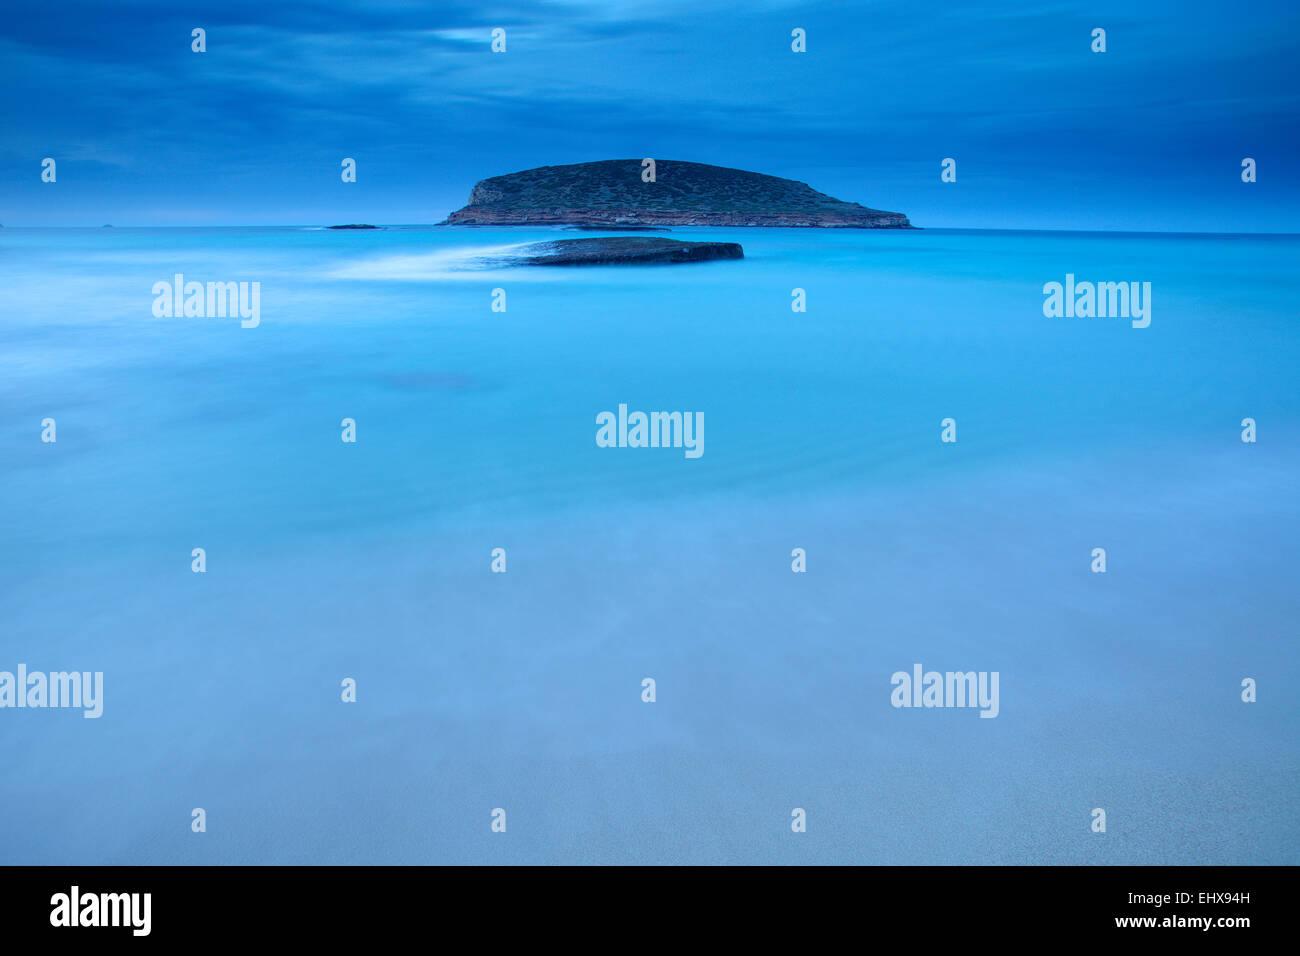 Spain, Ibiza, Cala Comte at blue hour Stock Photo